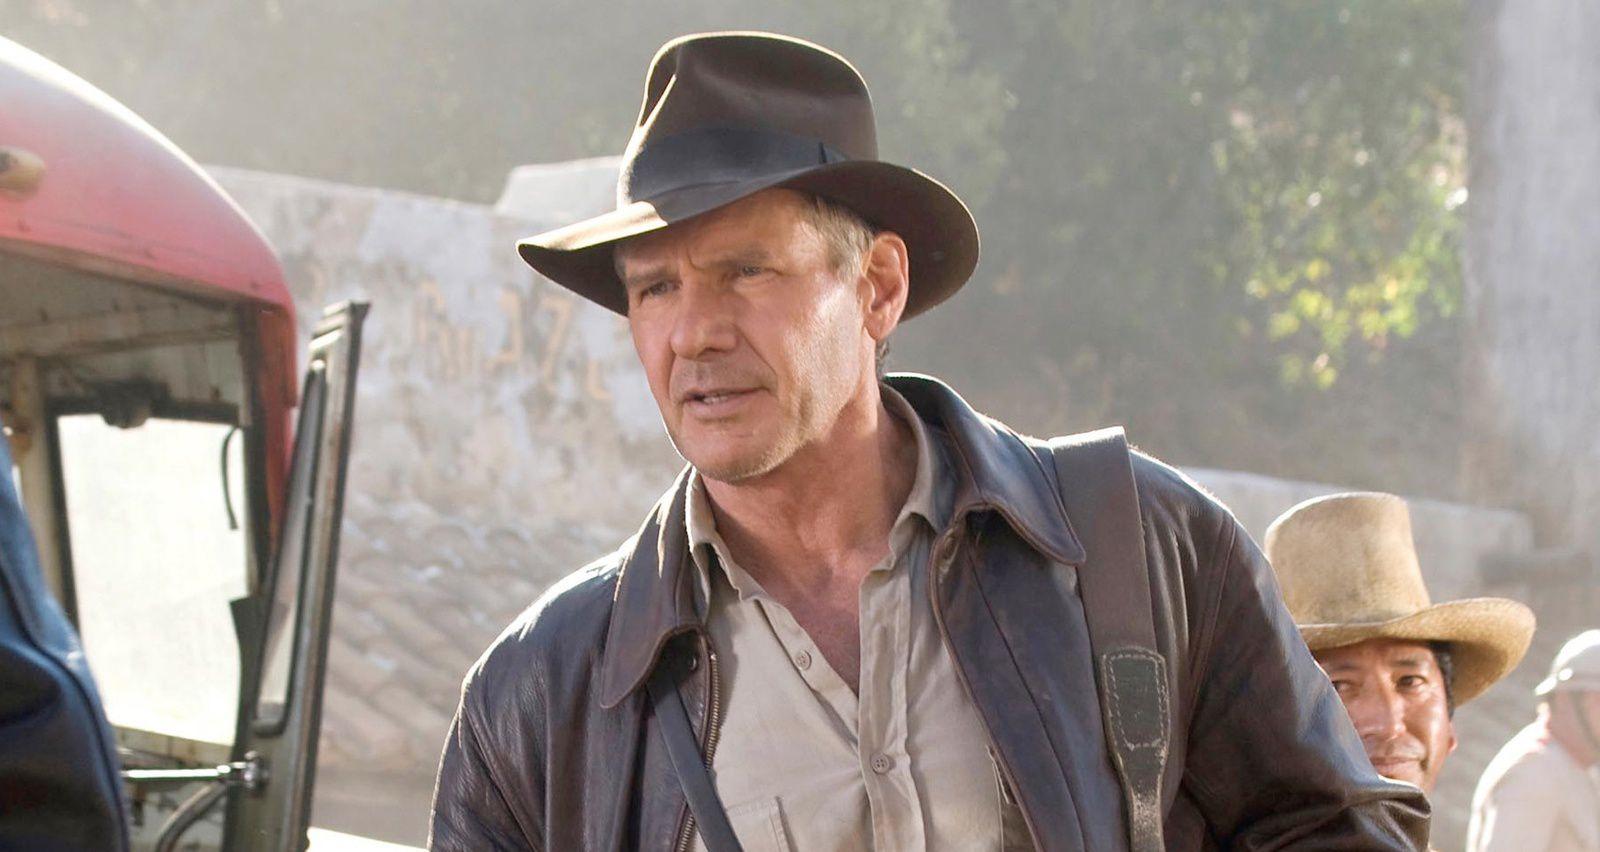 Indiana Jones 5 : tournage confirmé en avril 2019